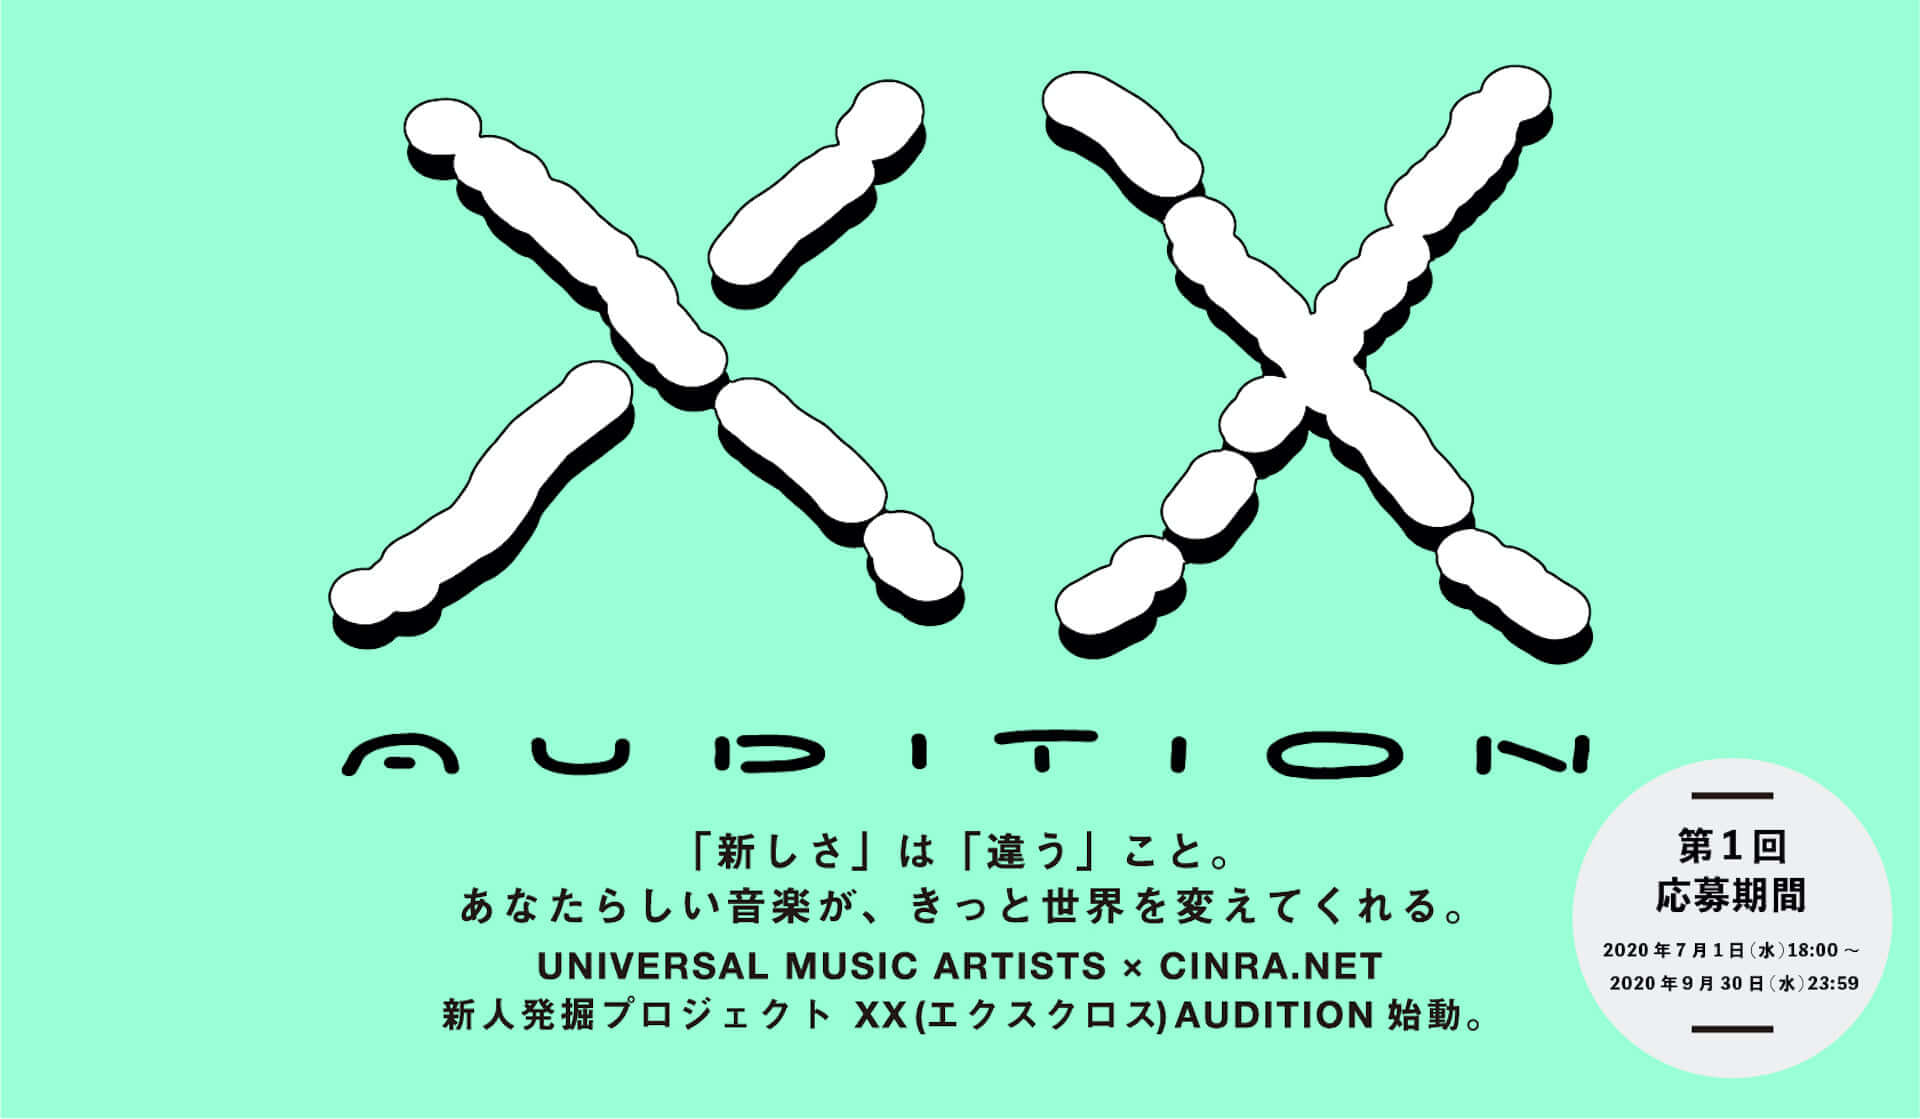 CINRA.NETとUMAが20XX年代の新人発掘プロジェクト「XX AUDITION」を始動 最優秀賞獲得者の音楽活動全般をサポート music200701_xxaudition_1-1920x1119